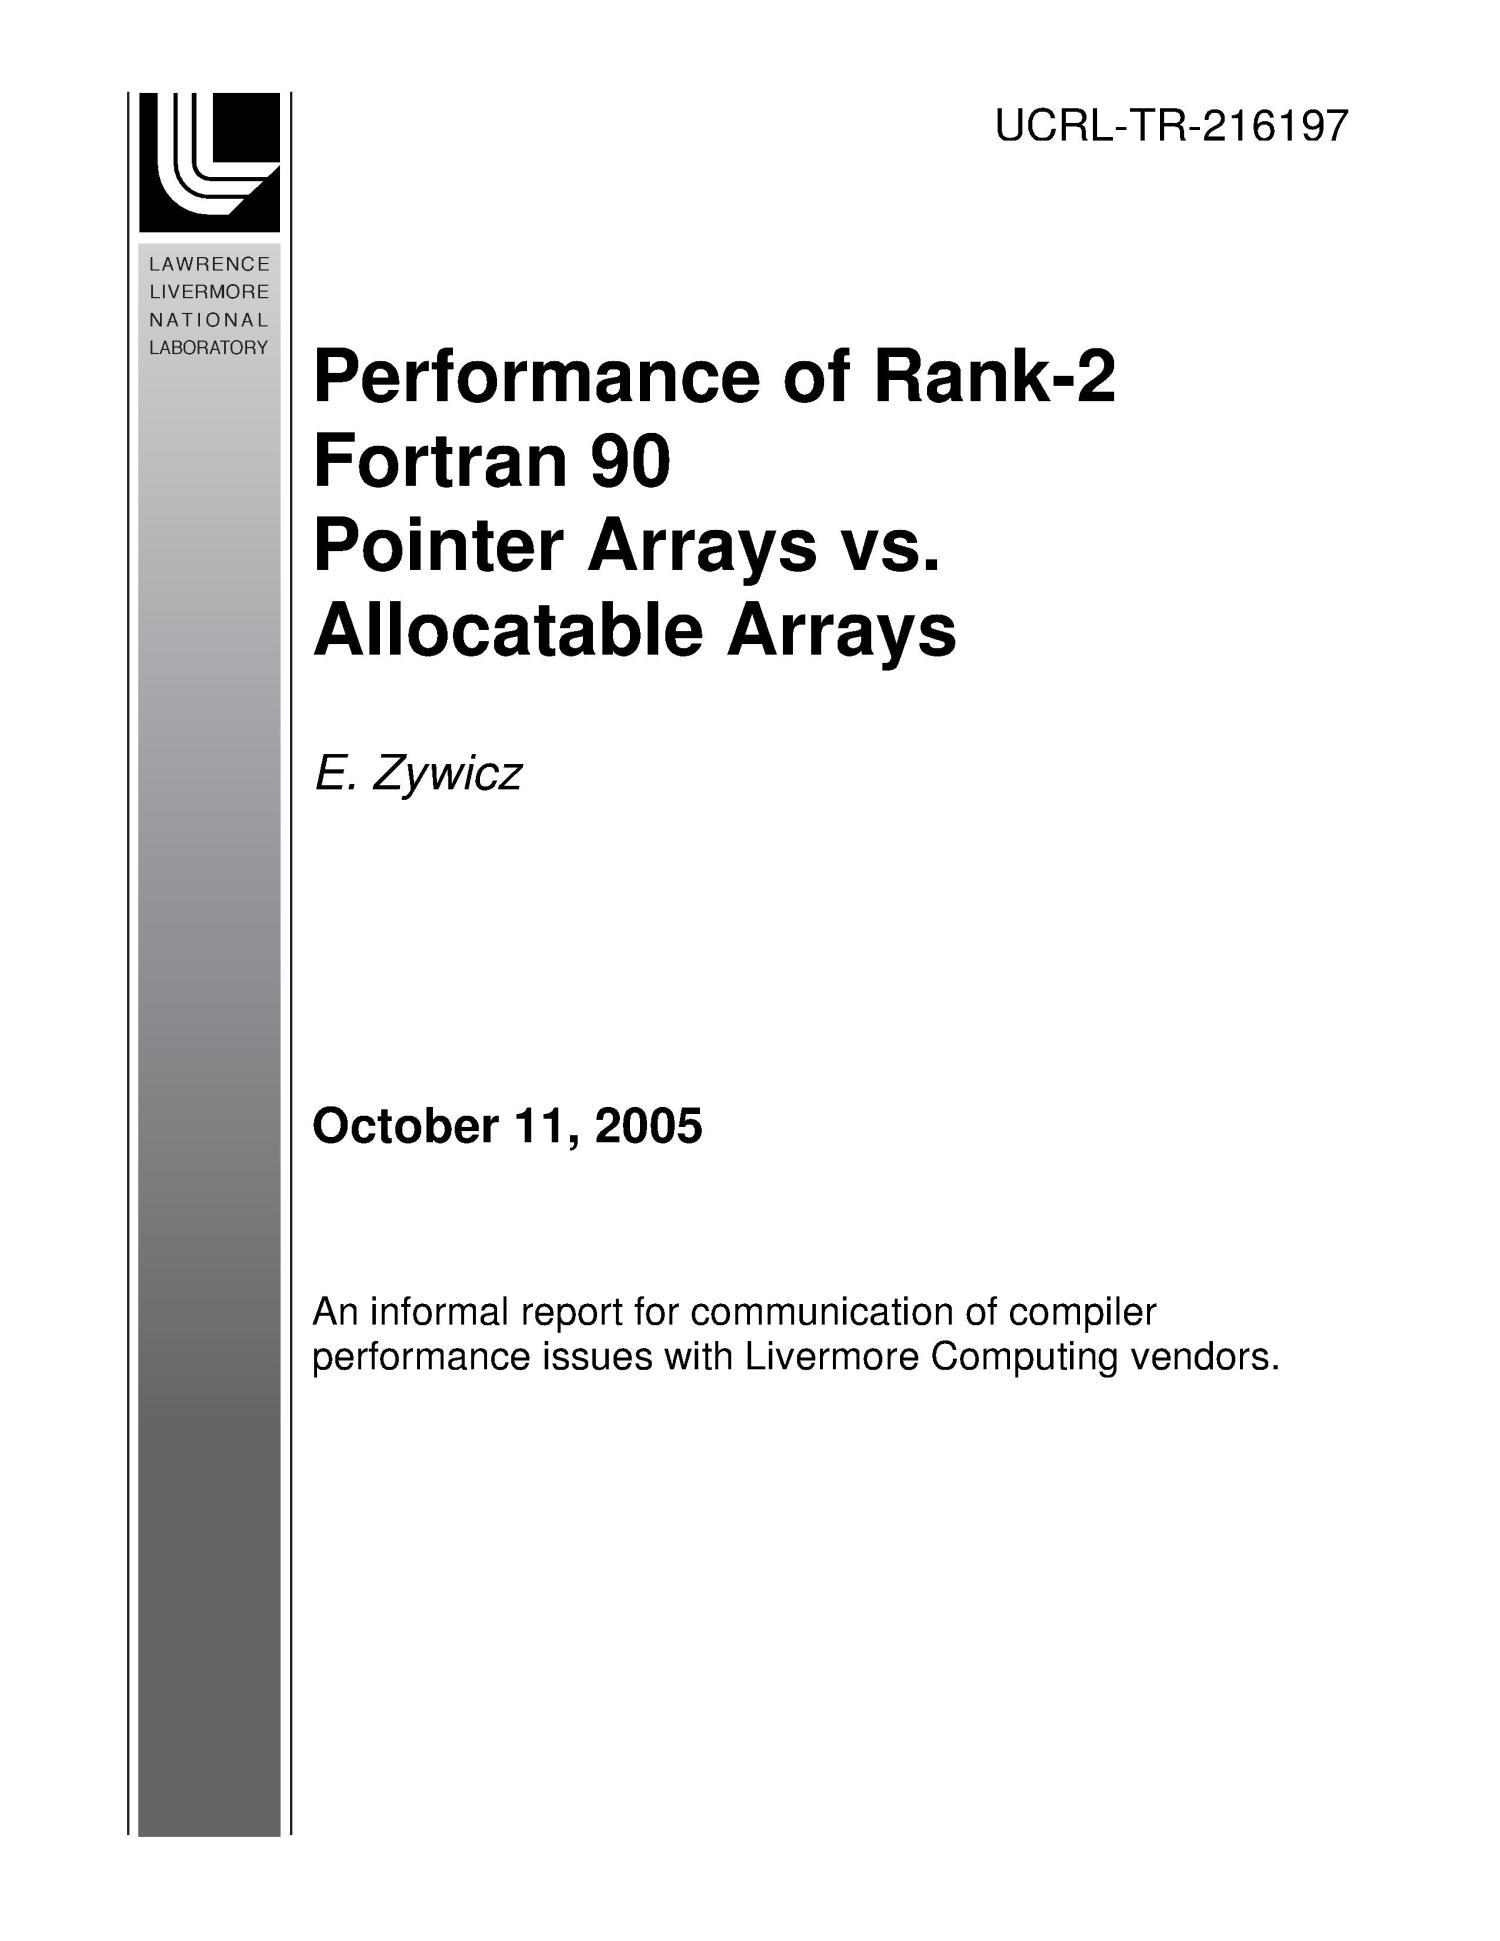 Performance of Rank-2 Fortran 90 Pointer Arrays vs